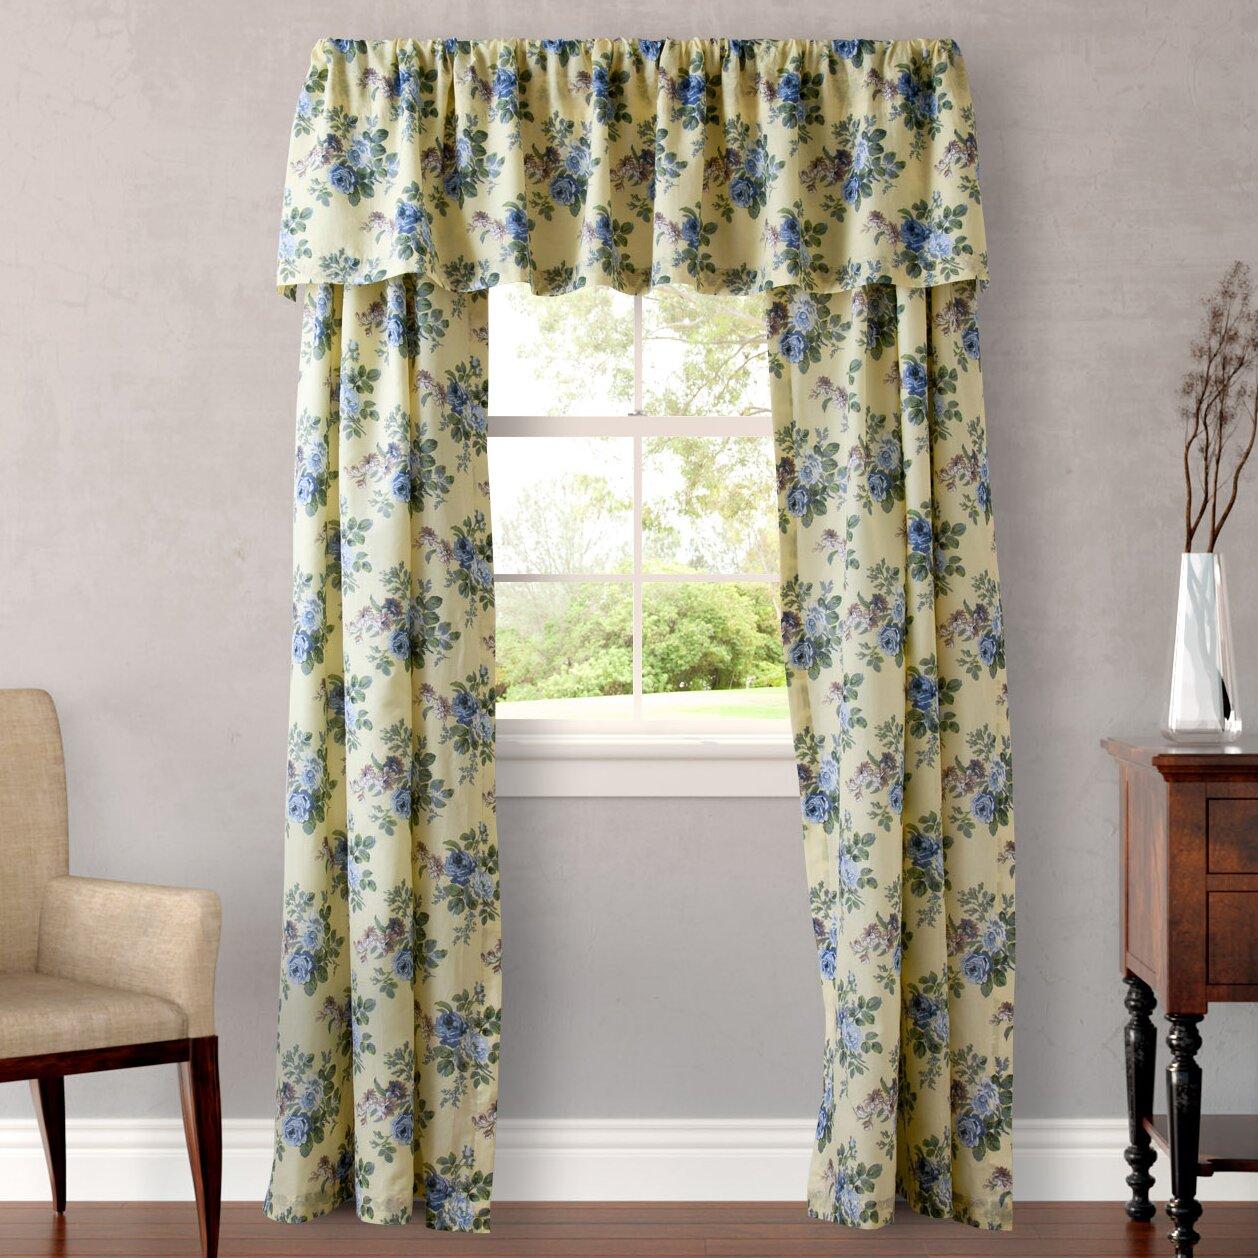 Laura Ashley Home Whitfield Drape Panels Reviews: Laura Ashley Home Linley Curtain Panels & Reviews